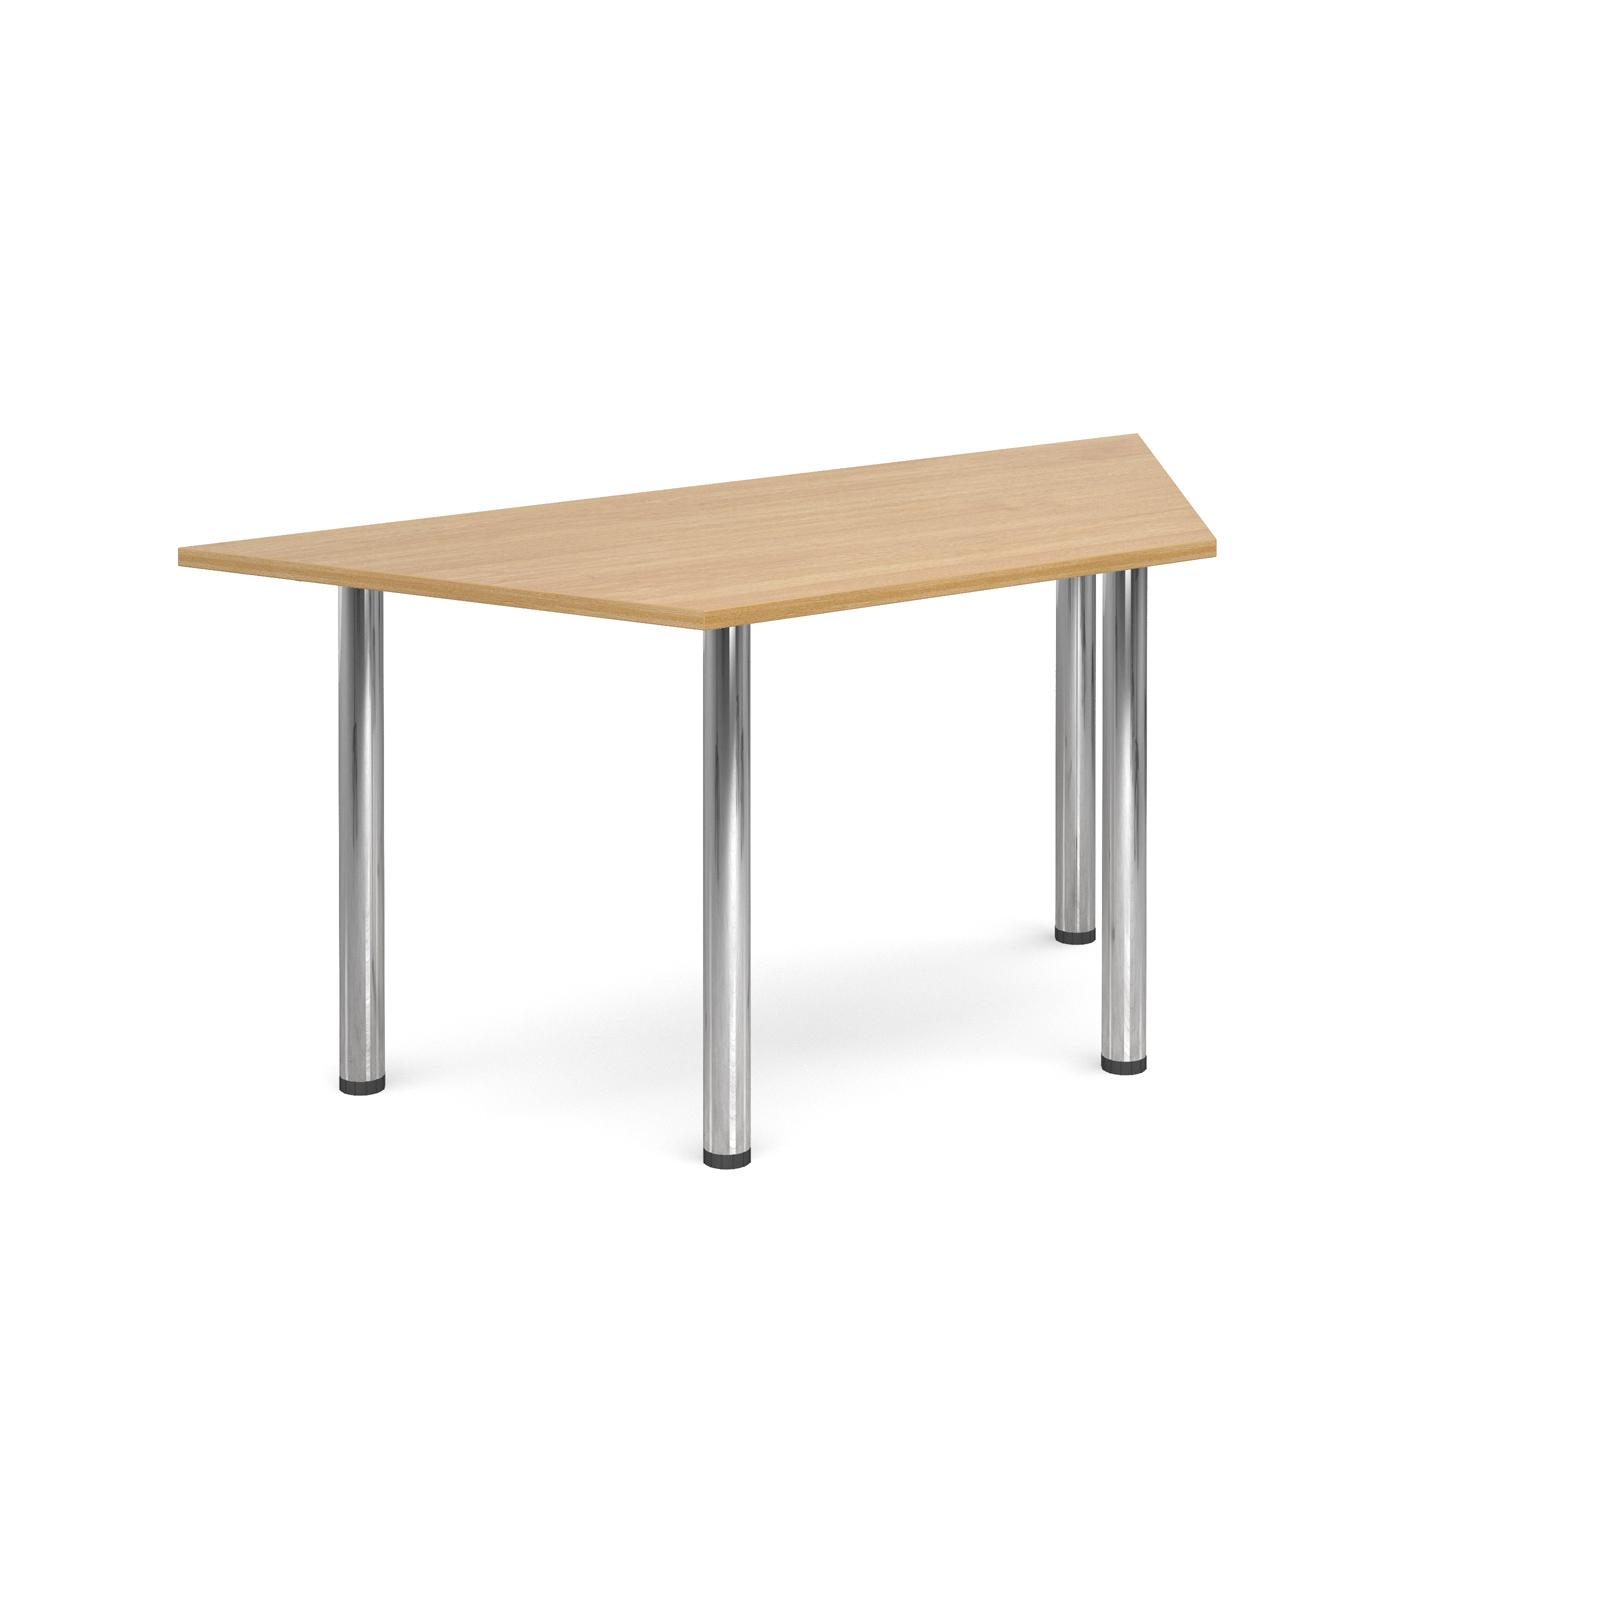 Trapezoidal deluxe chrome radial leg table 1600mm x 800mm - oak